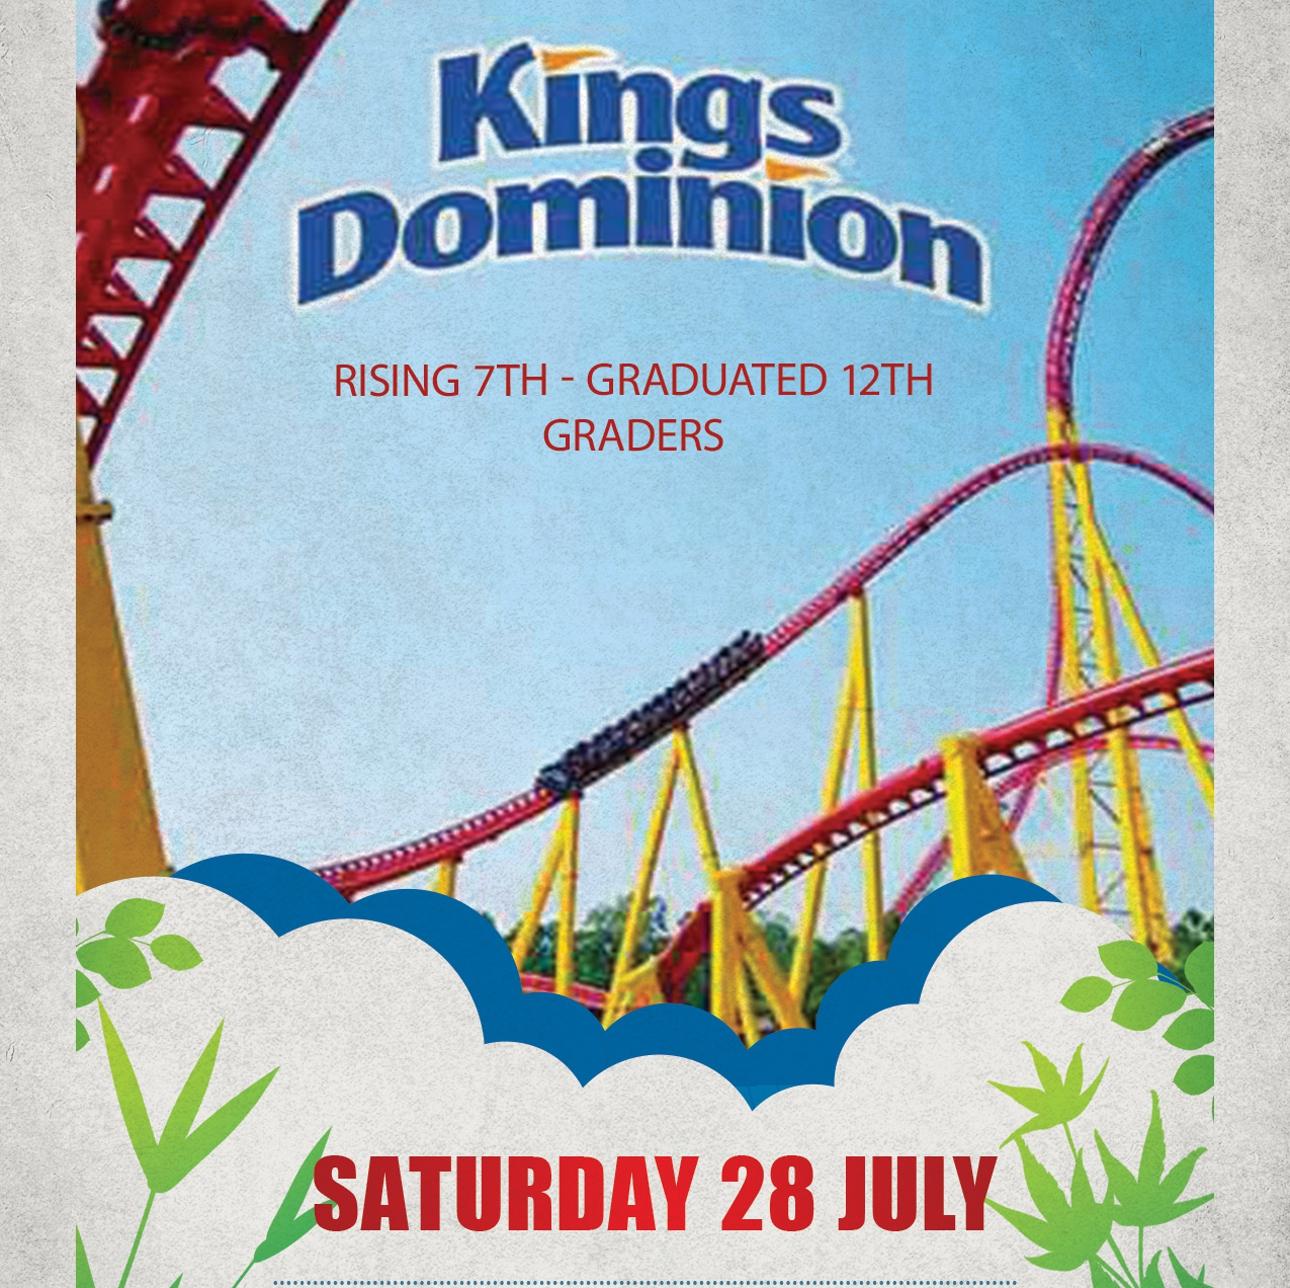 Kings dominion slide